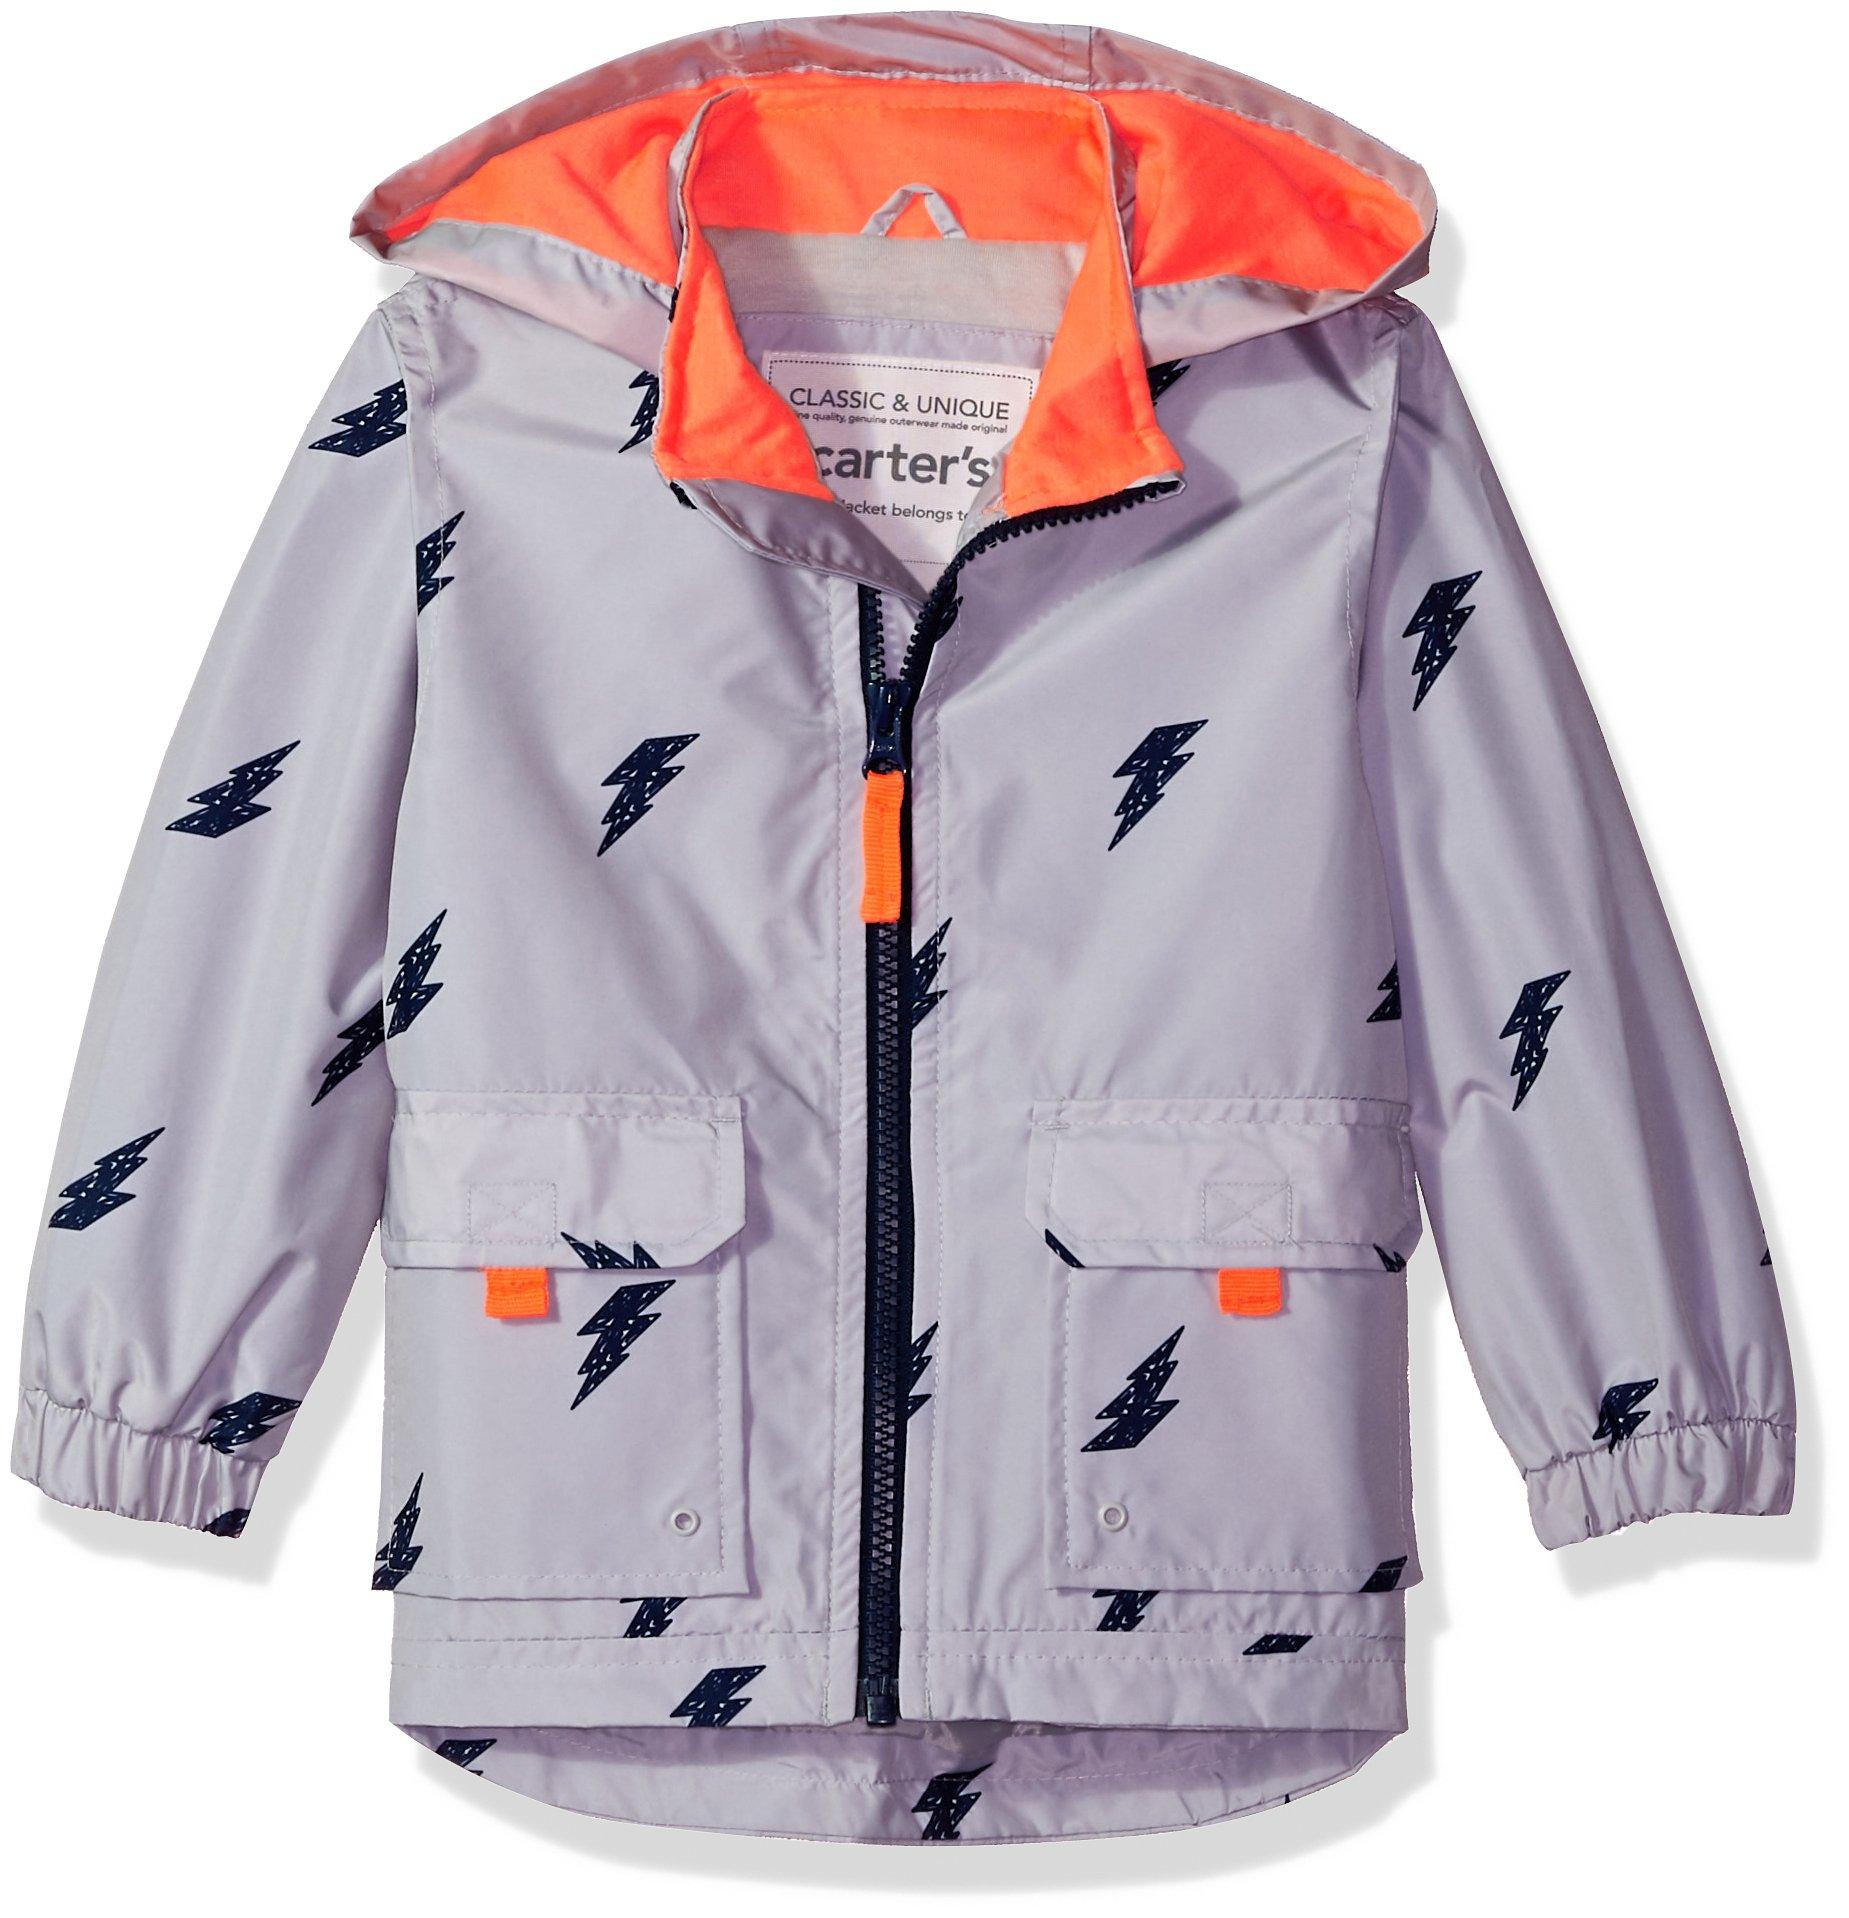 Carter's Little Boys' His Favorite Rainslicker Rain Jacket, Lightening Bolt Gray, 5/6